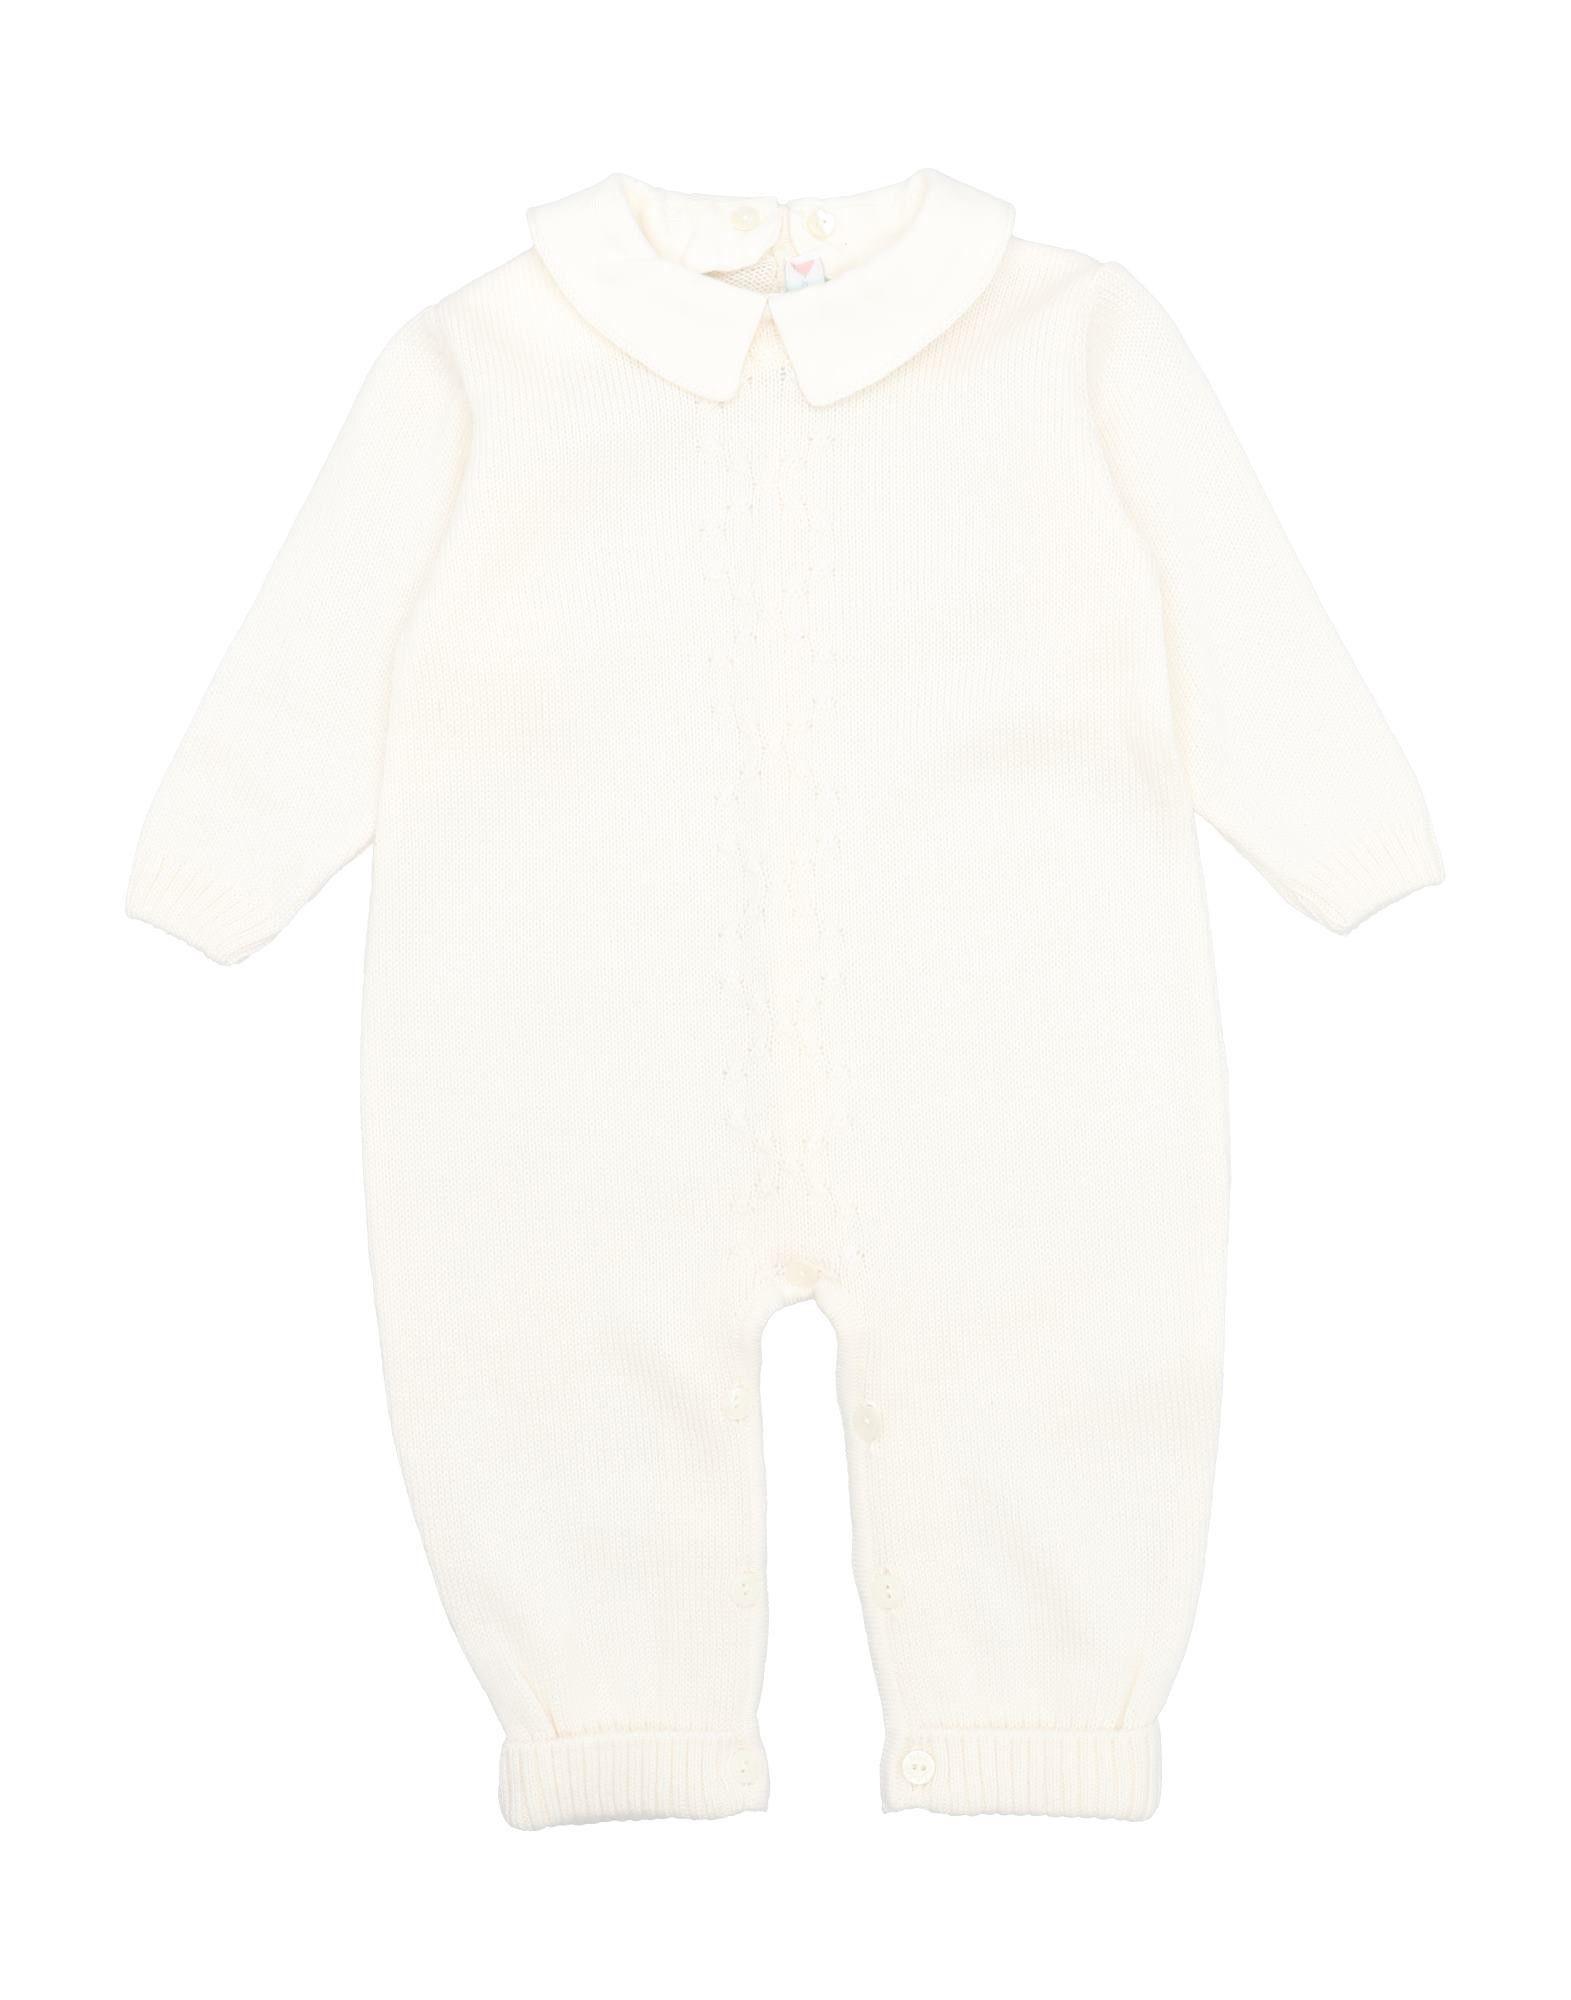 YOOX.COM(ユークス)《セール開催中》BEBEBO' ガールズ 0-24 ヶ月 乳幼児用ロンパース アイボリー 6 ウール 100%